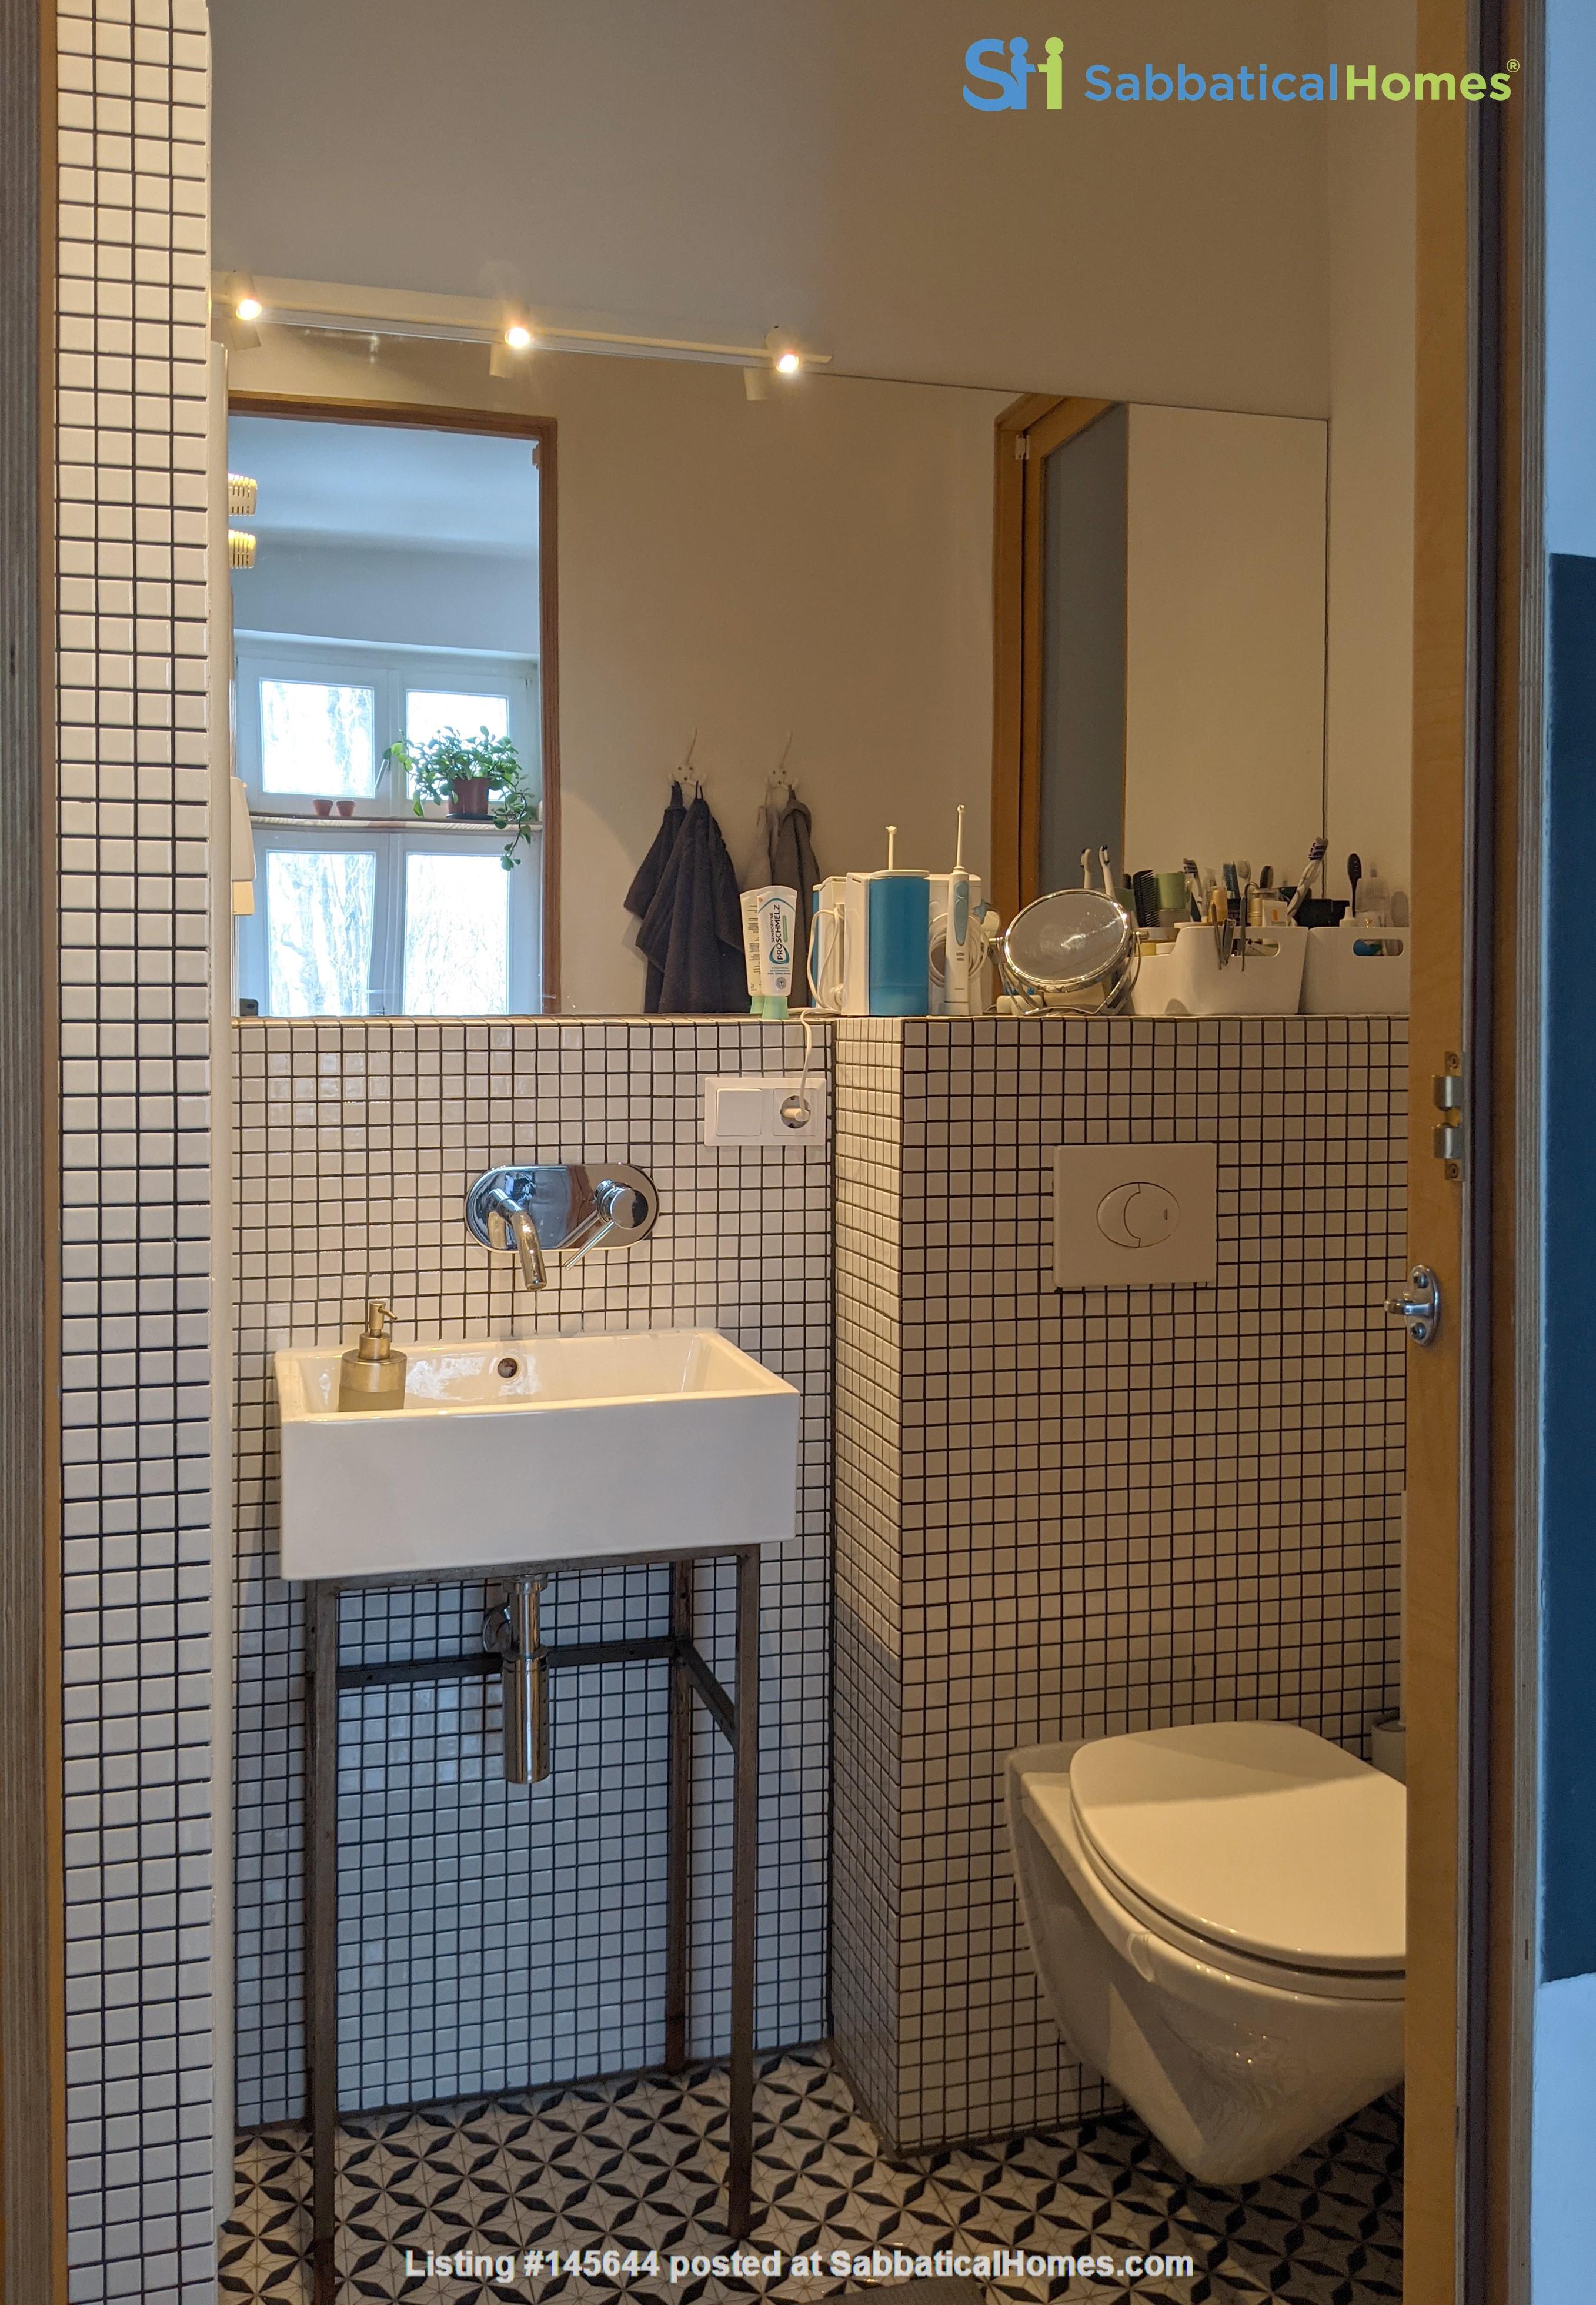 September-November: Your Brooklyn NYC for my Berlin Wedding-Mitte Home Exchange in Berlin, Berlin, Germany 6